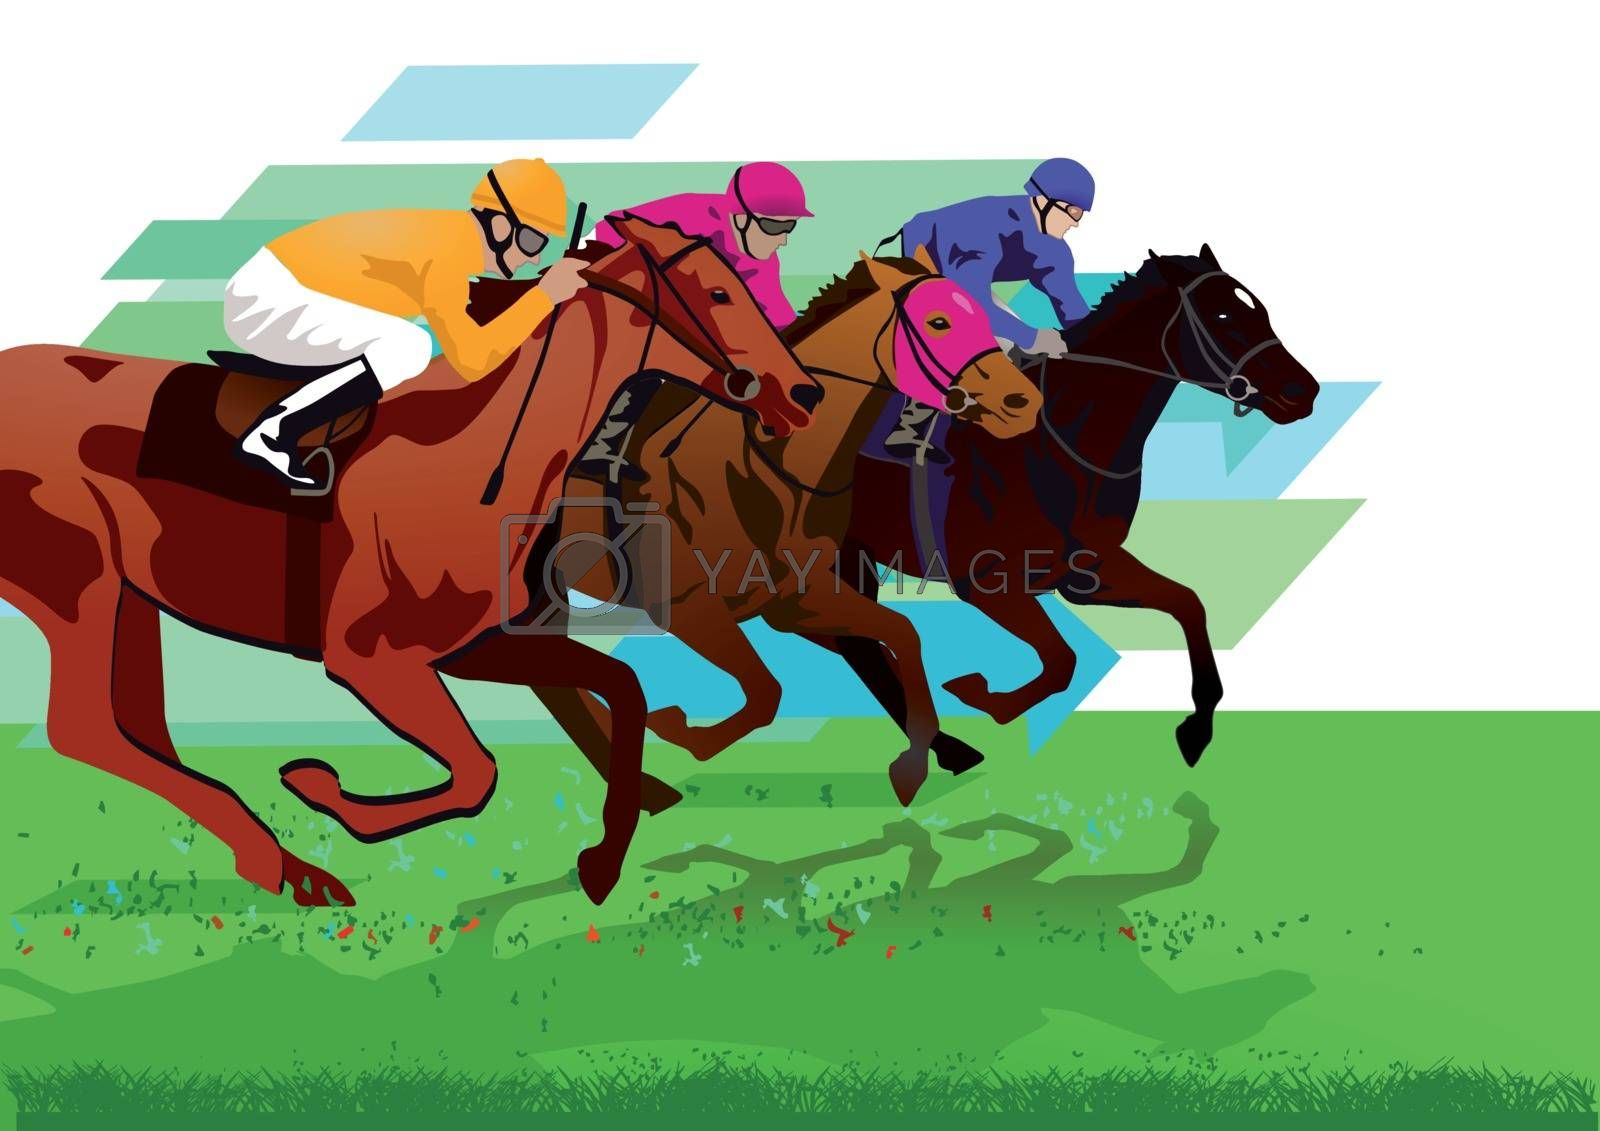 Jockeys with racehorses on the racetrack